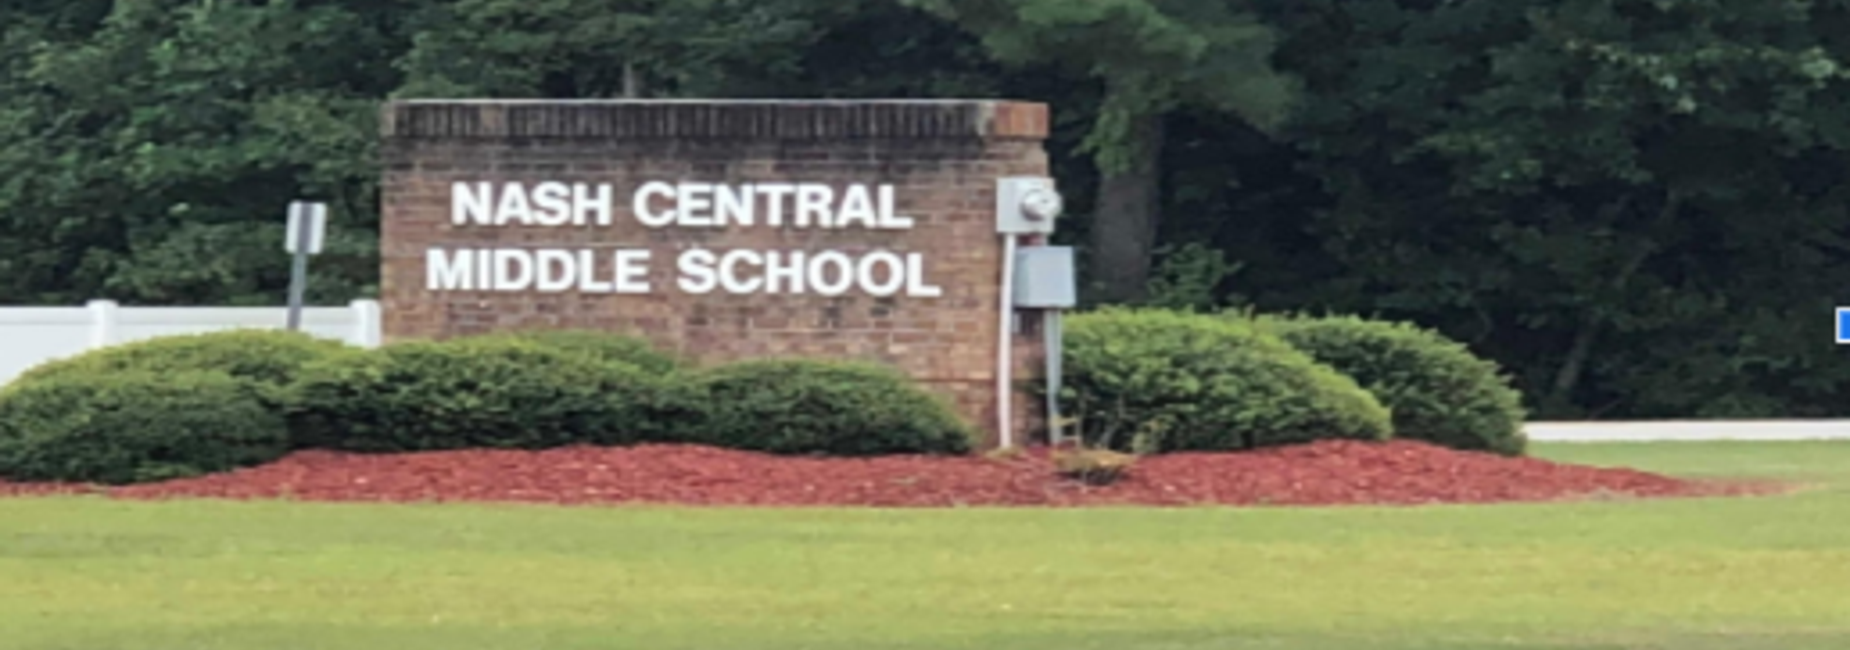 Nash Central Middle School sign